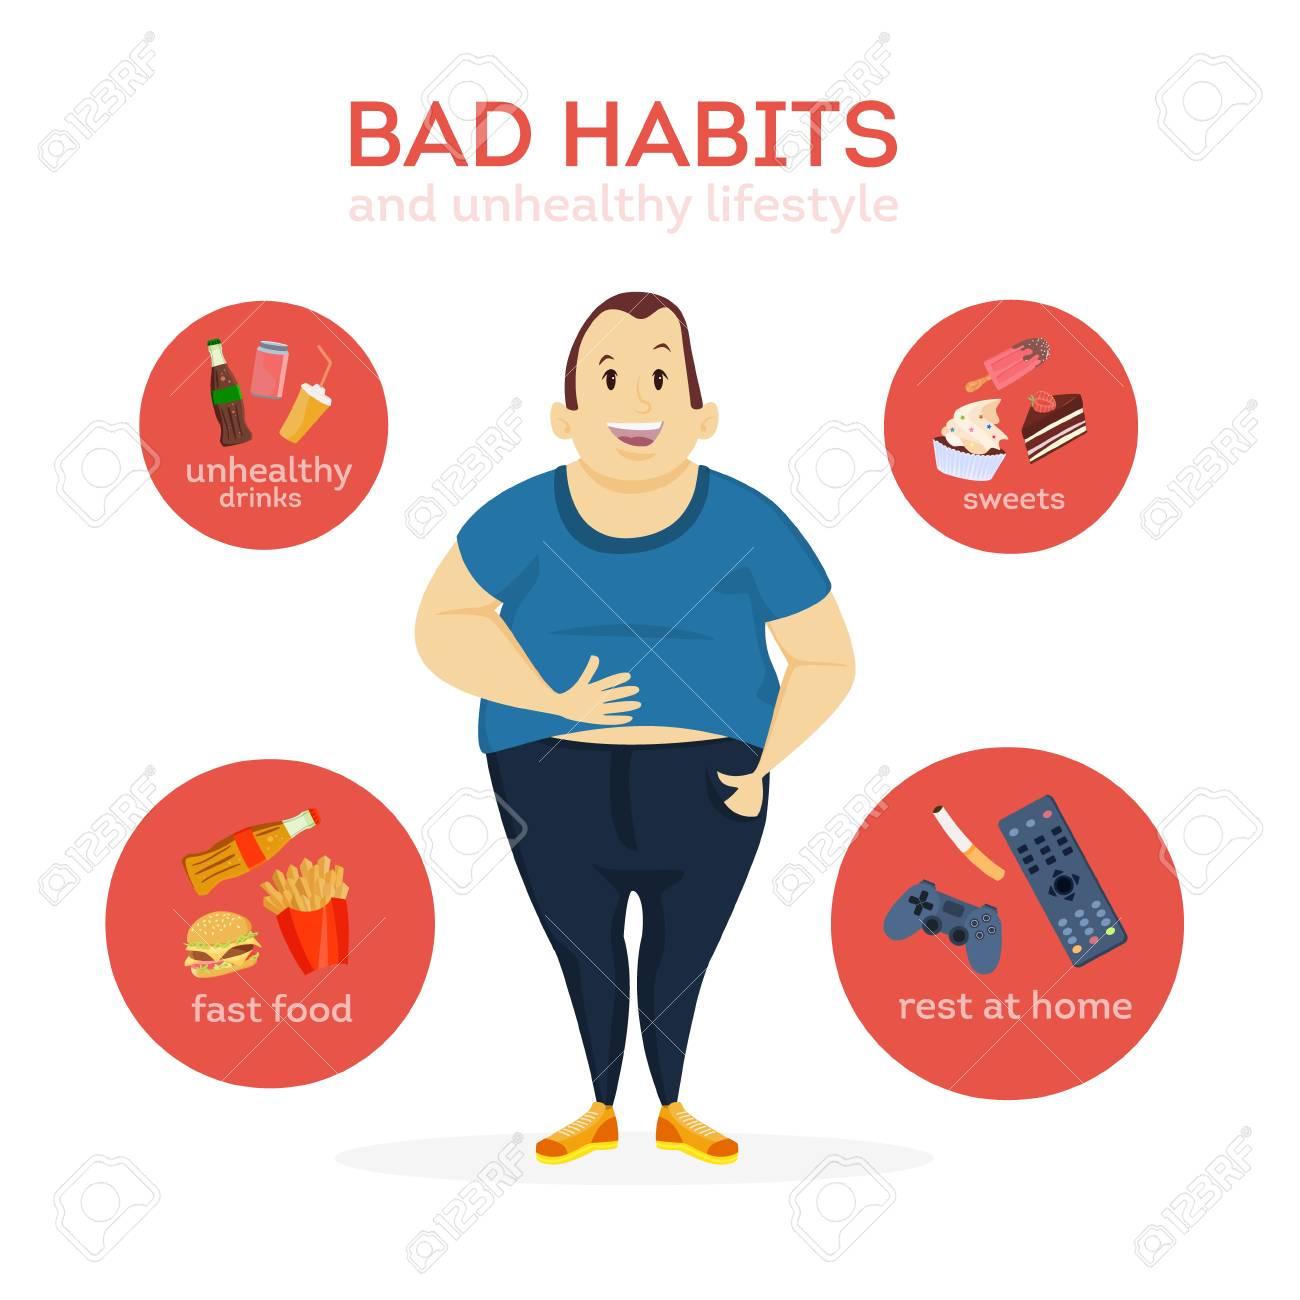 Cartoon man image and bad habits illustration - 97357200